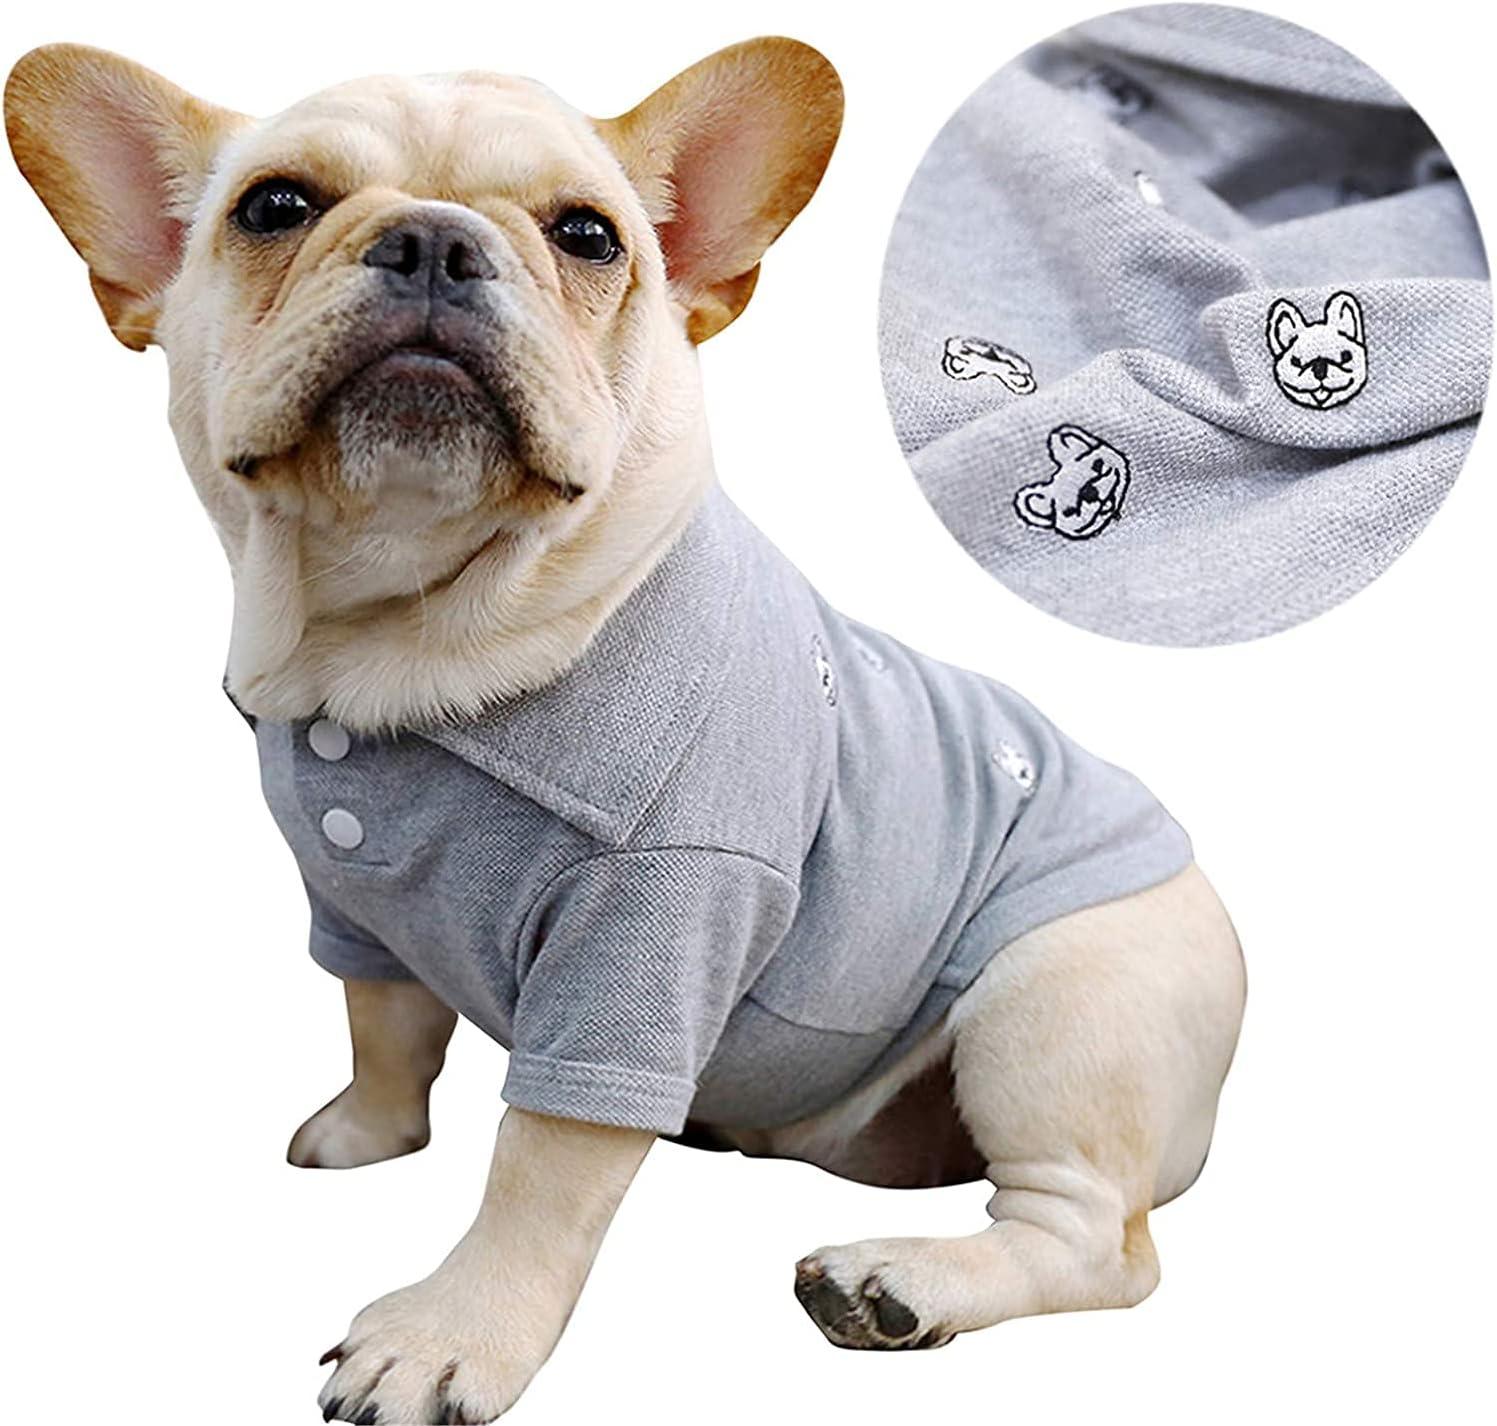 Kohza Dog 1 year warranty Shirt Puppy Pet Clothes fo Summer trust Small